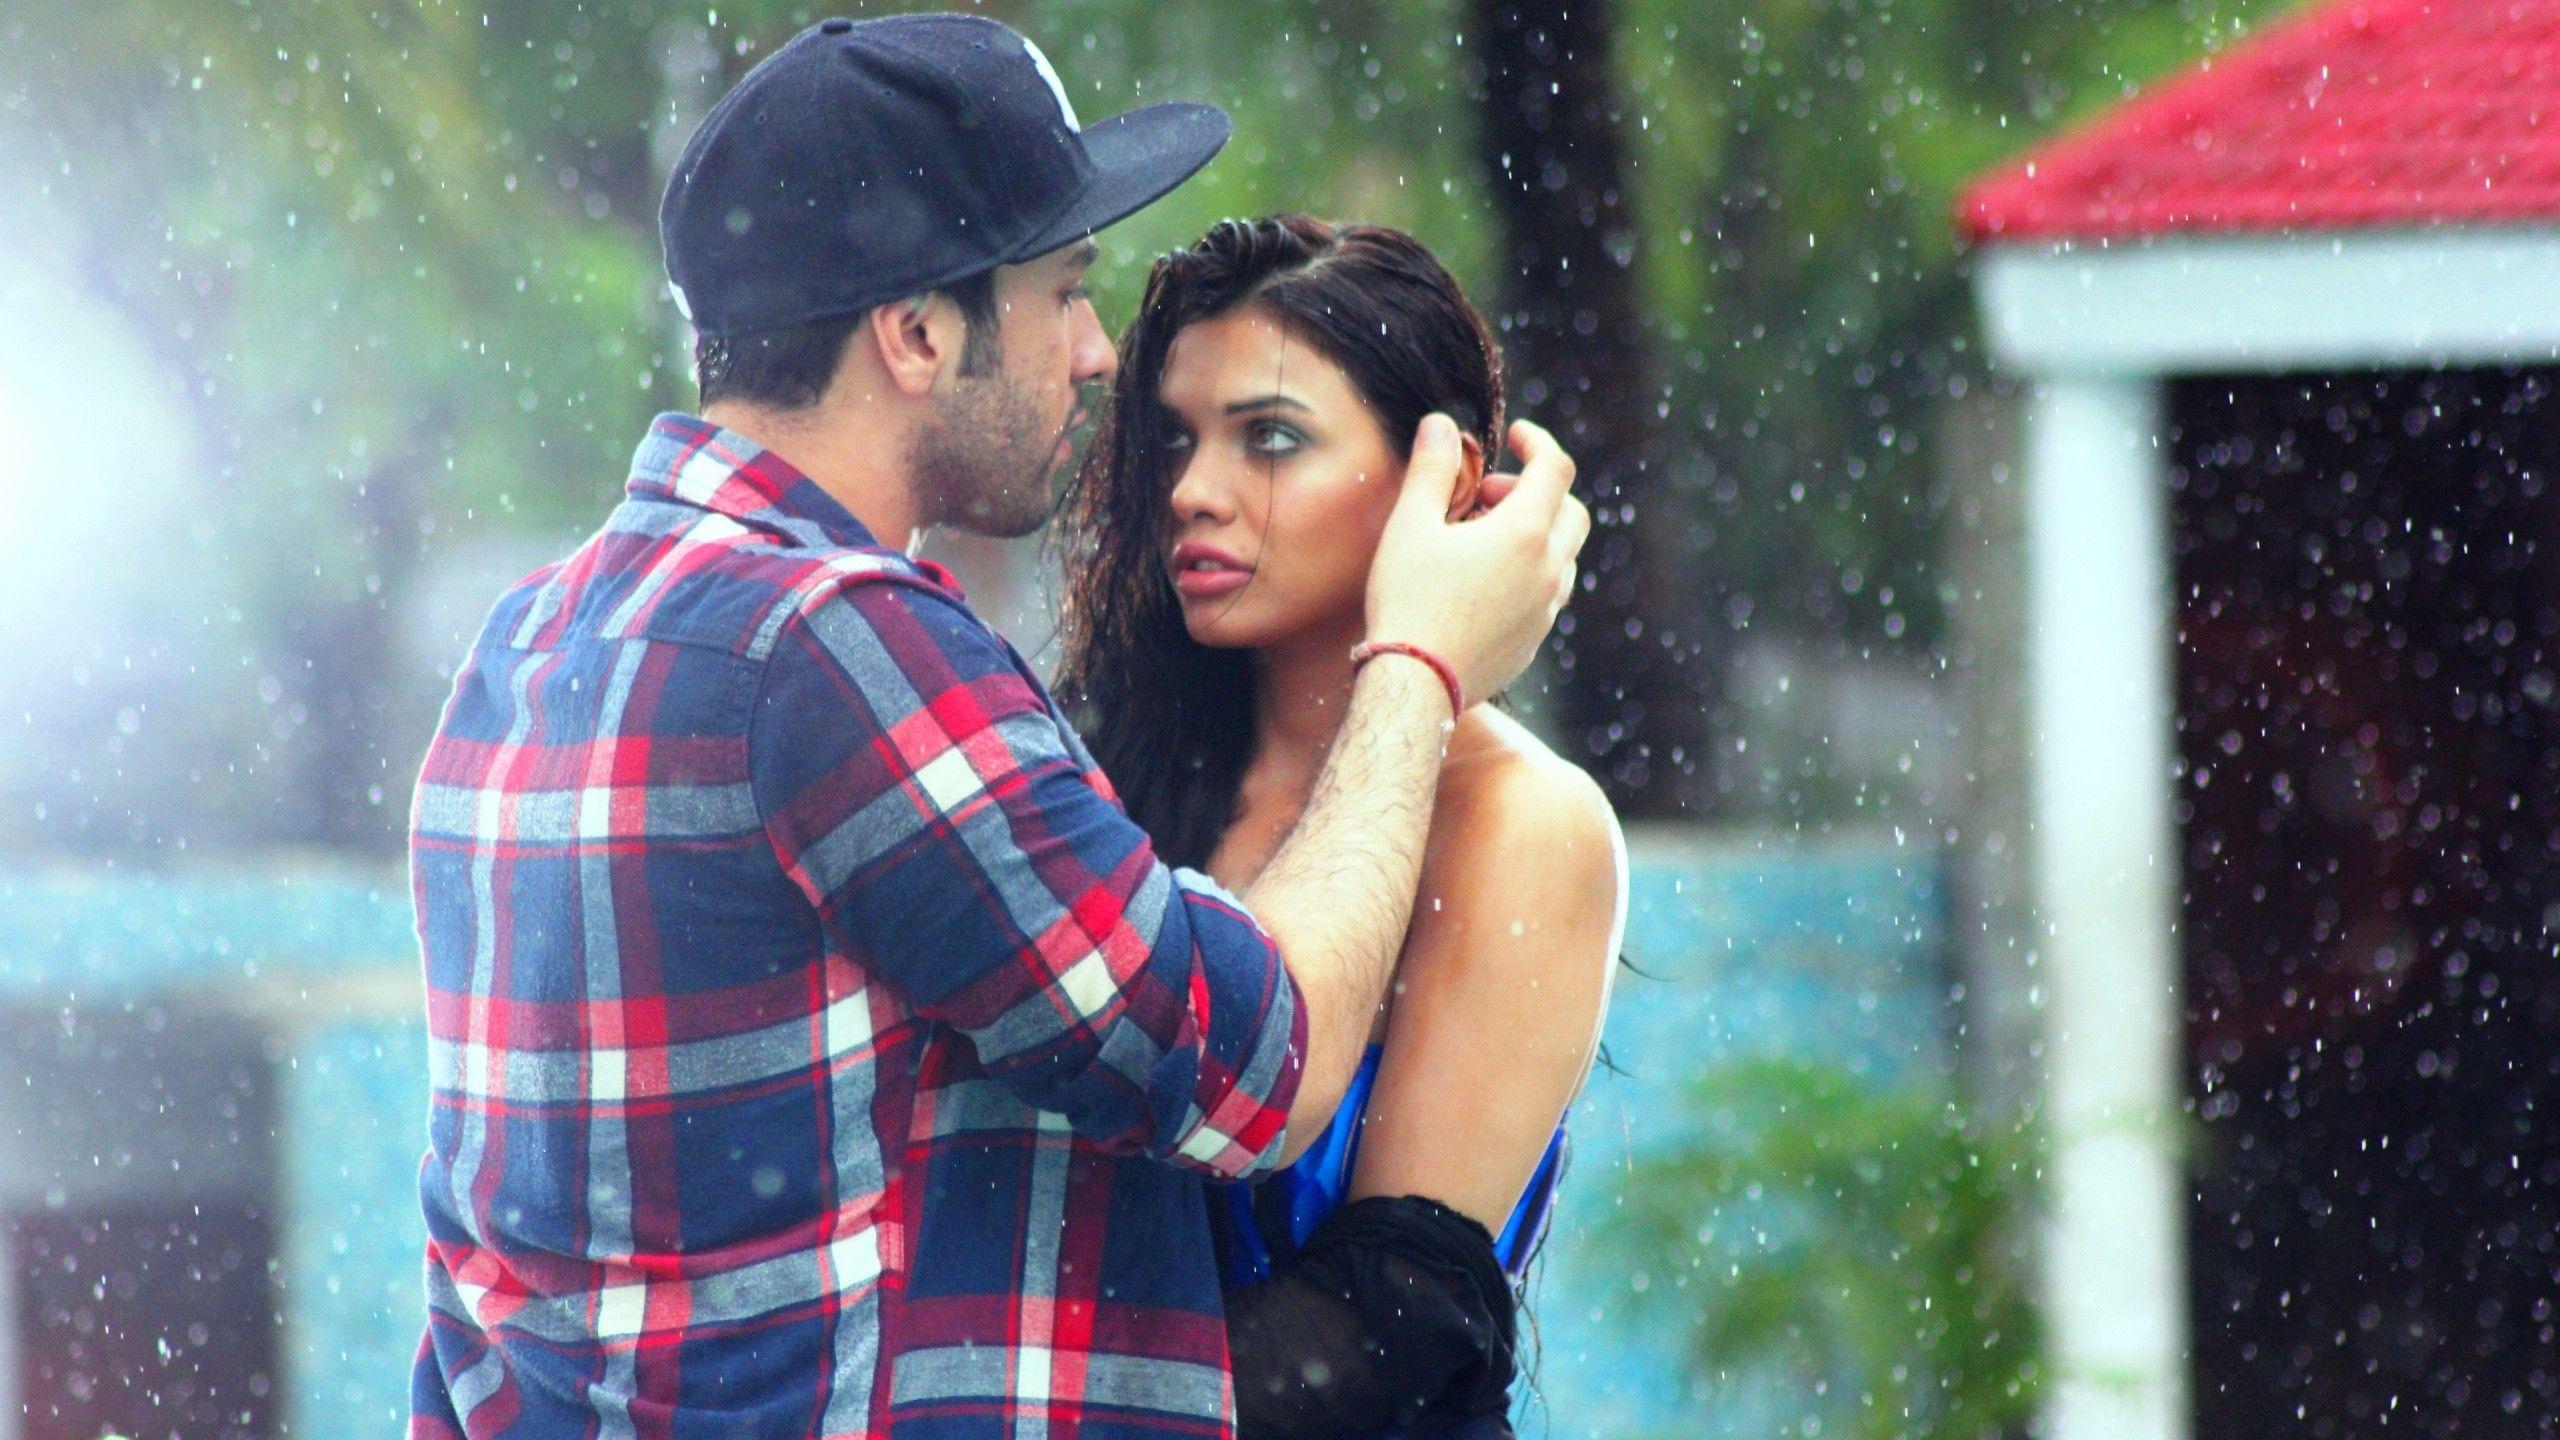 Rain Romantic Couple Wallpapers